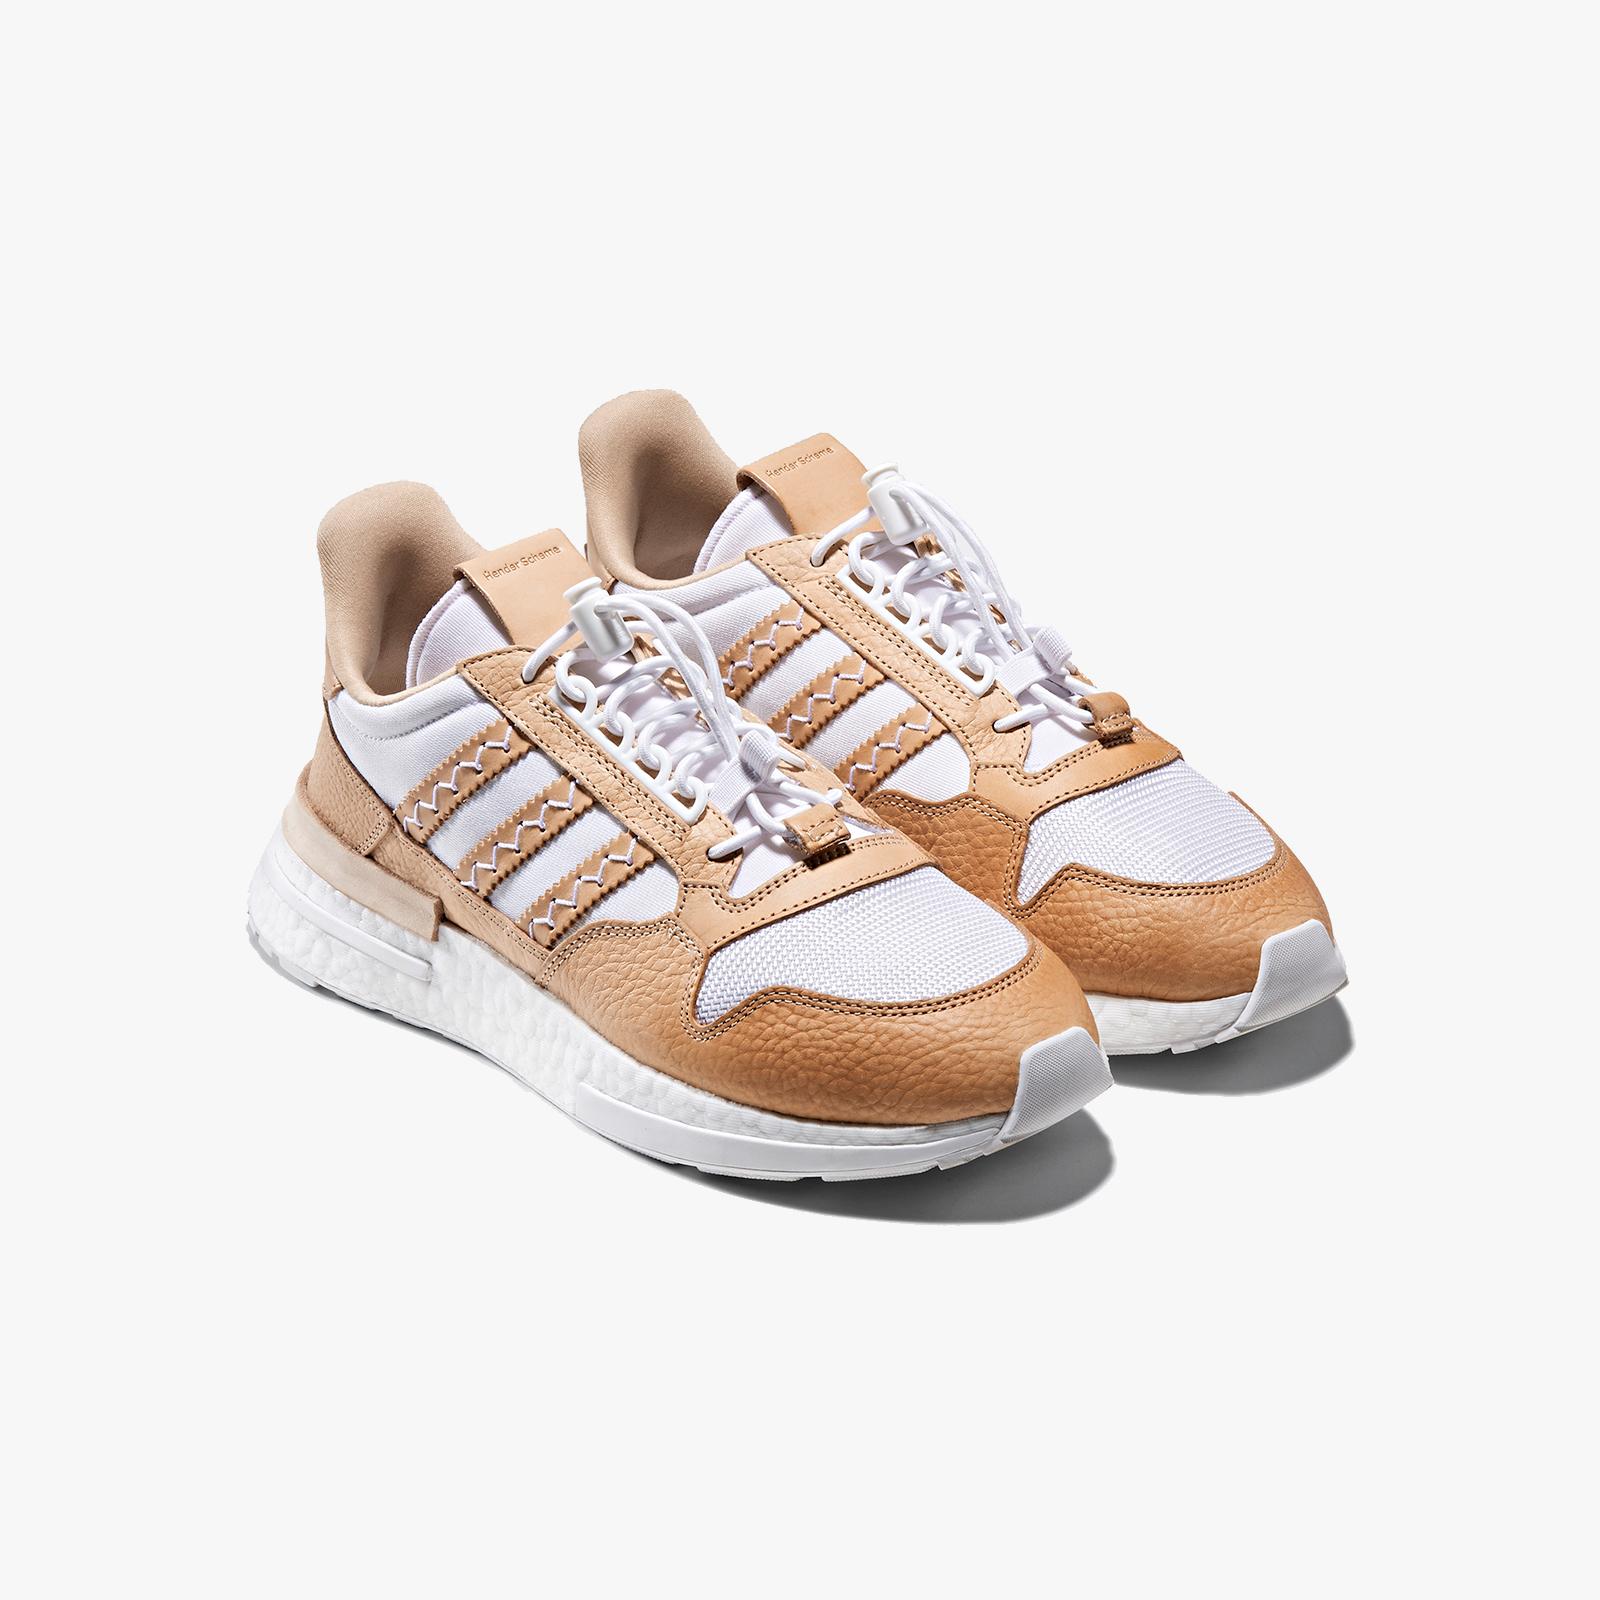 af3675ec35b555 adidas ZX 500 RM MT x Hender Scheme - F36047 - Sneakersnstuff ...